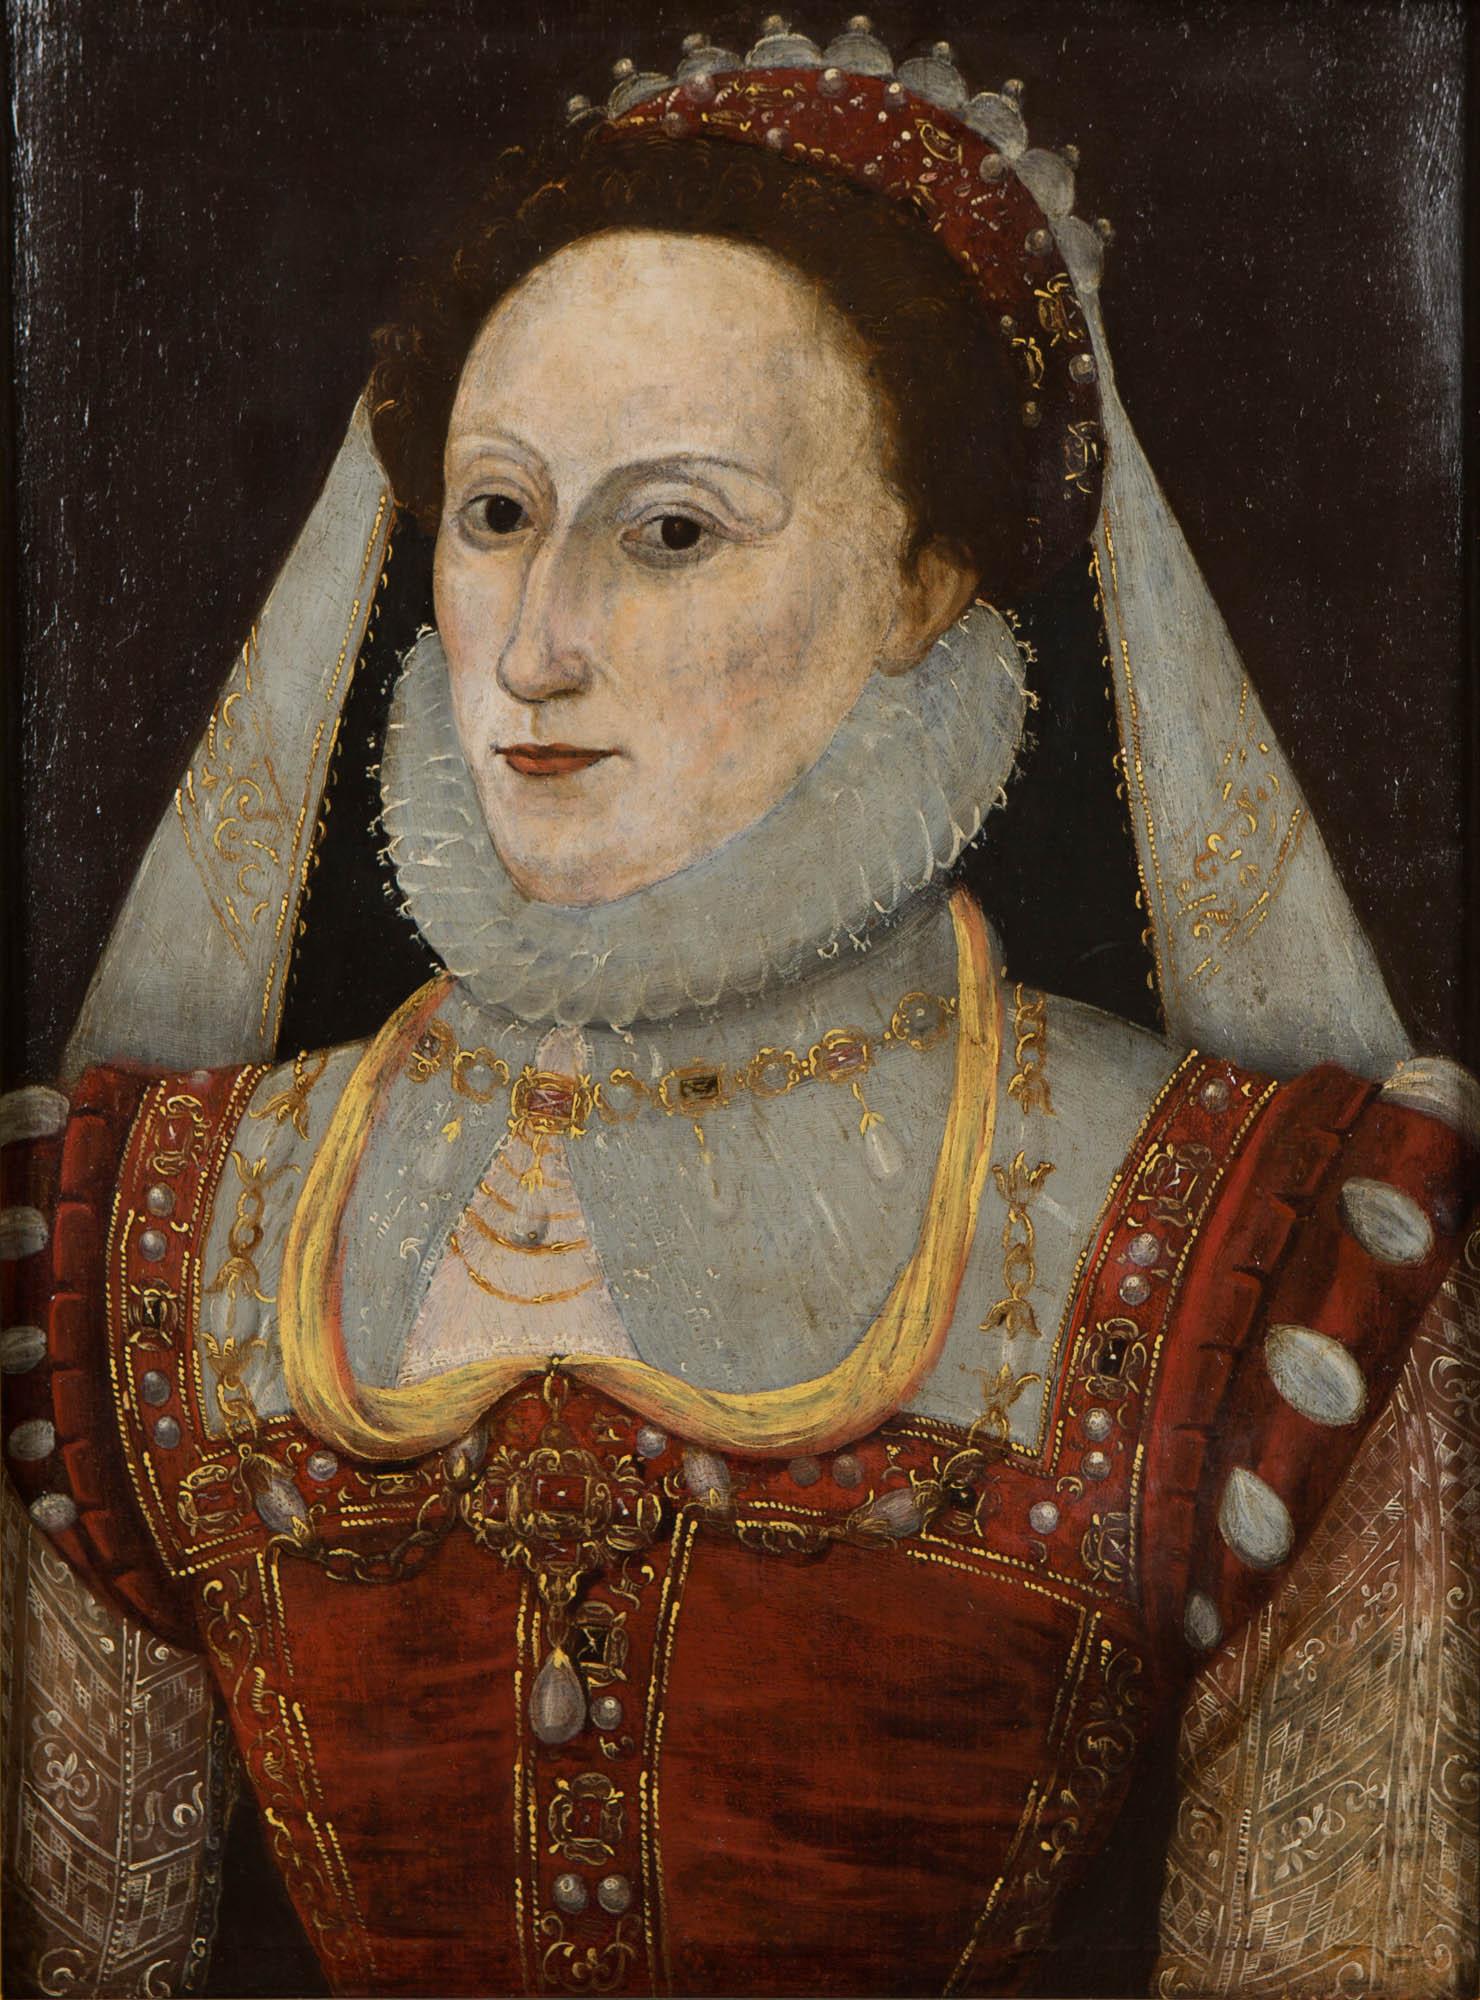 Portrait of Queen Elizabeth (1533-1603), English School.